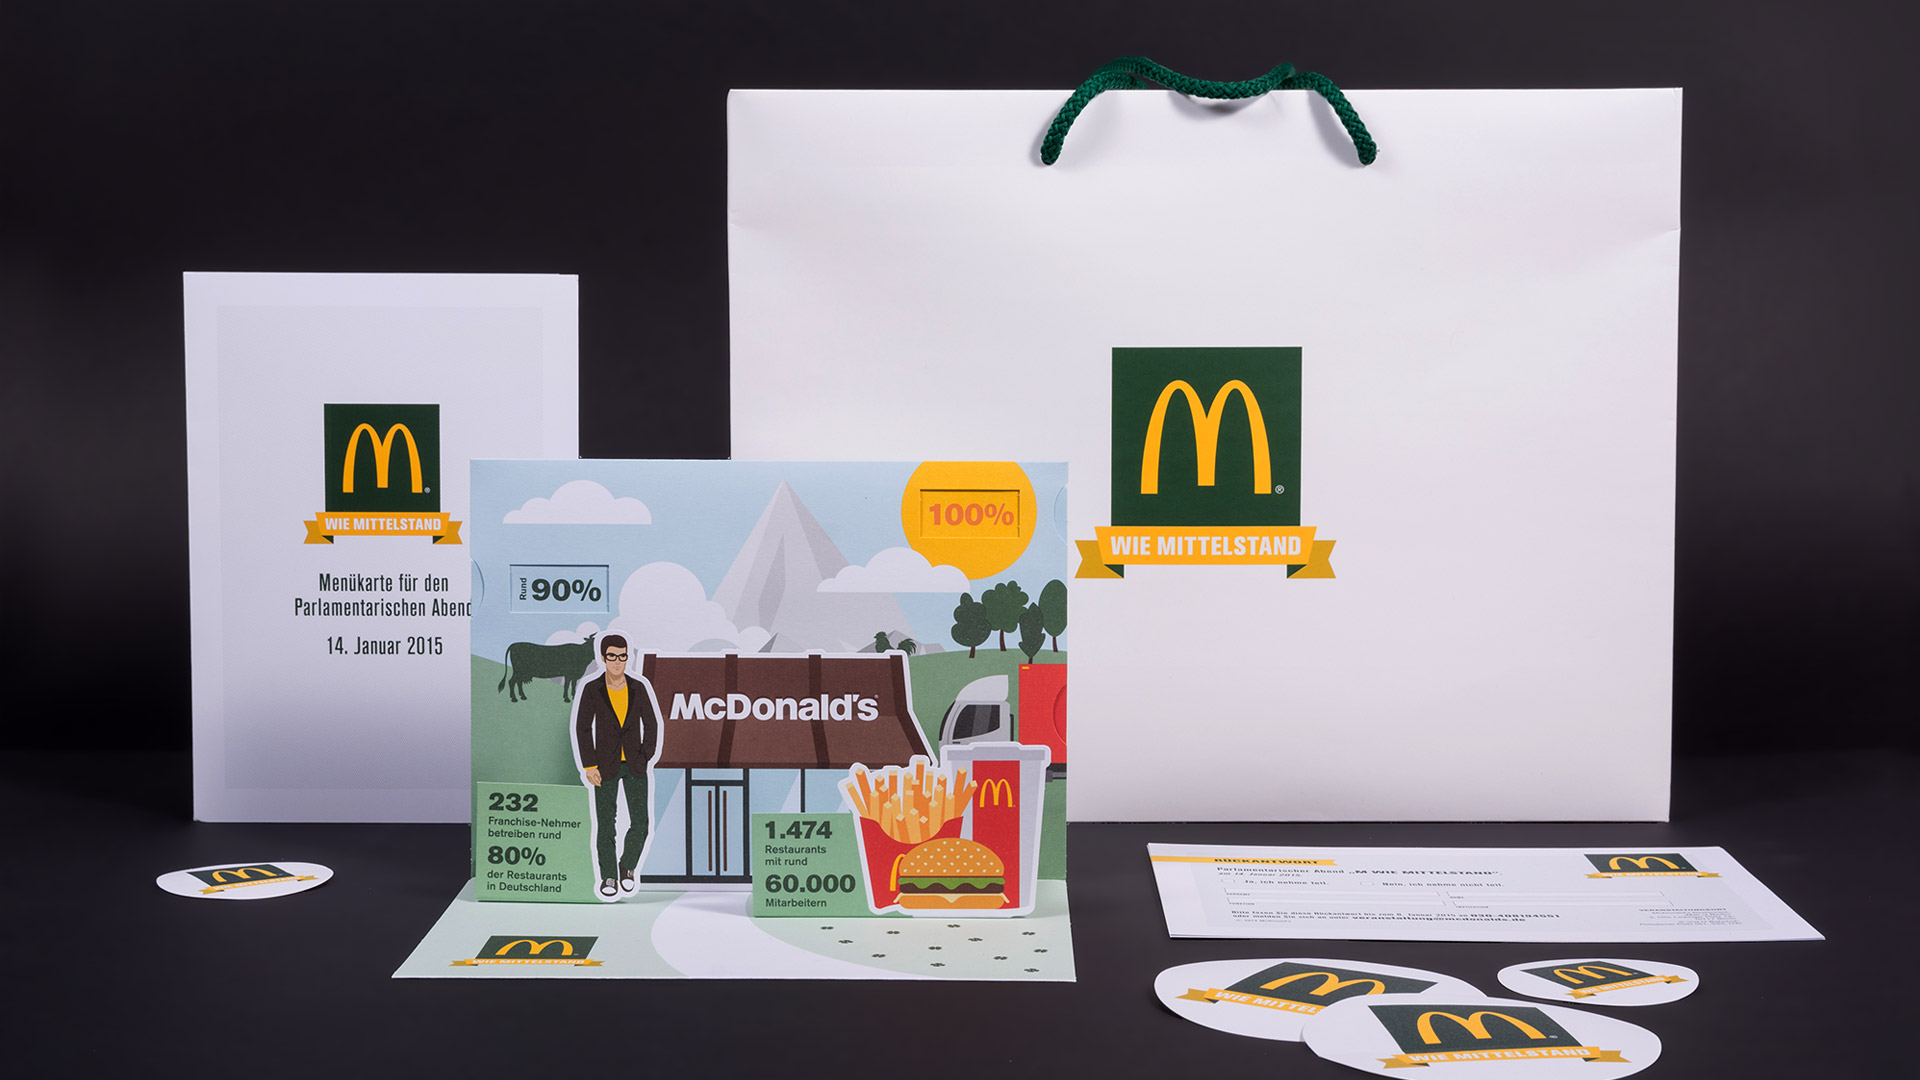 Gesamtpaket McDonald's Parlamentarischer Abend